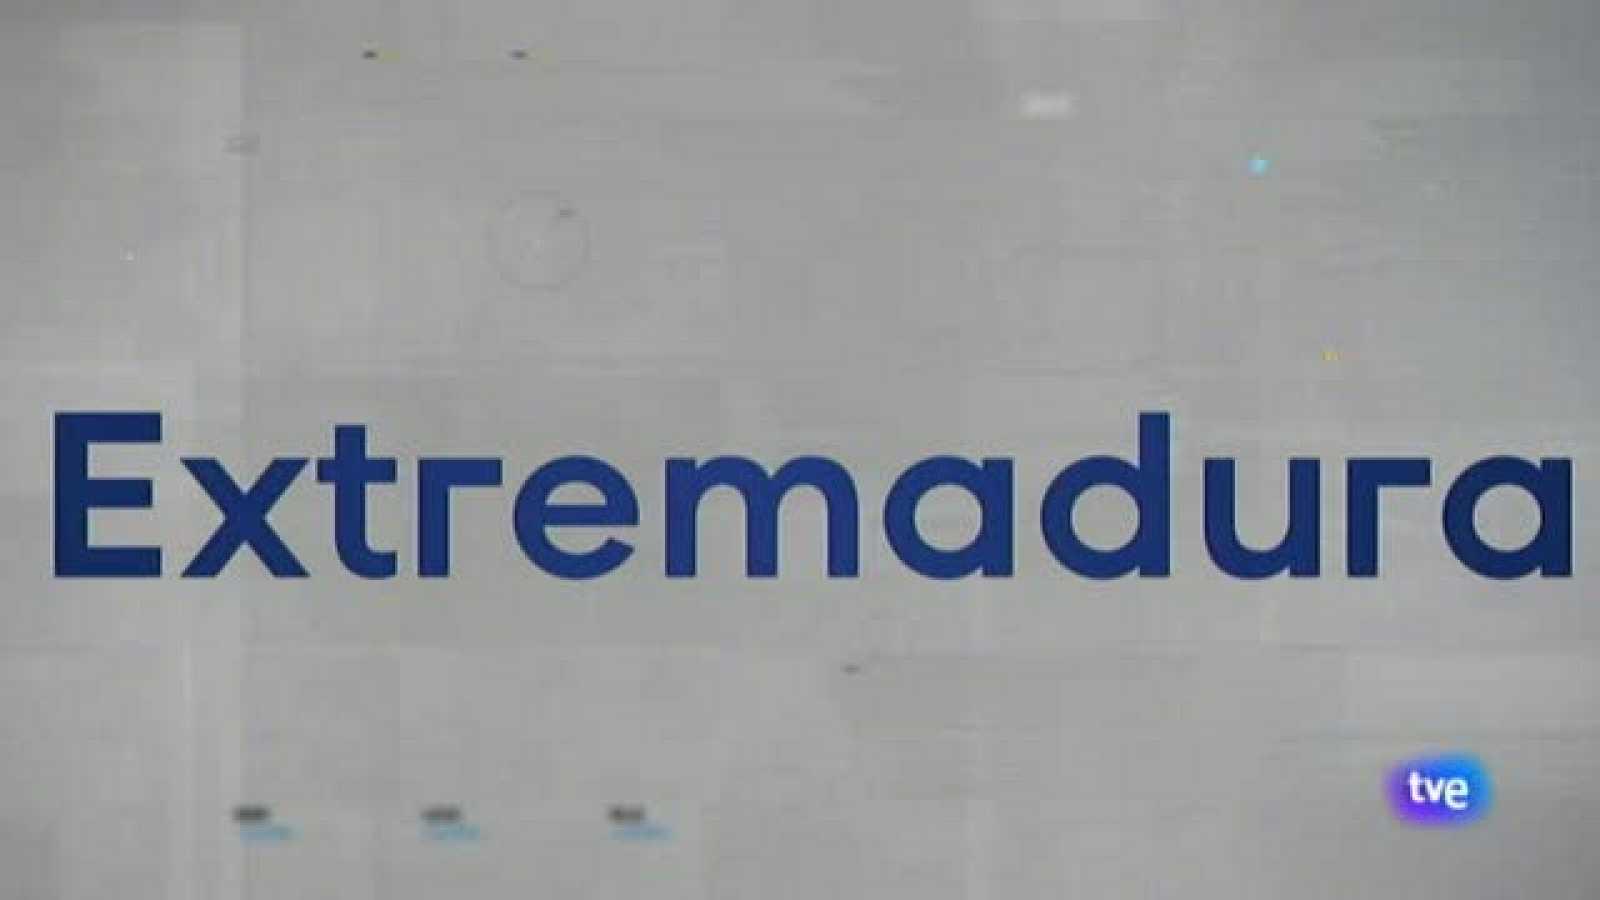 Noticias de Extremadura 2 - 14/04/2021